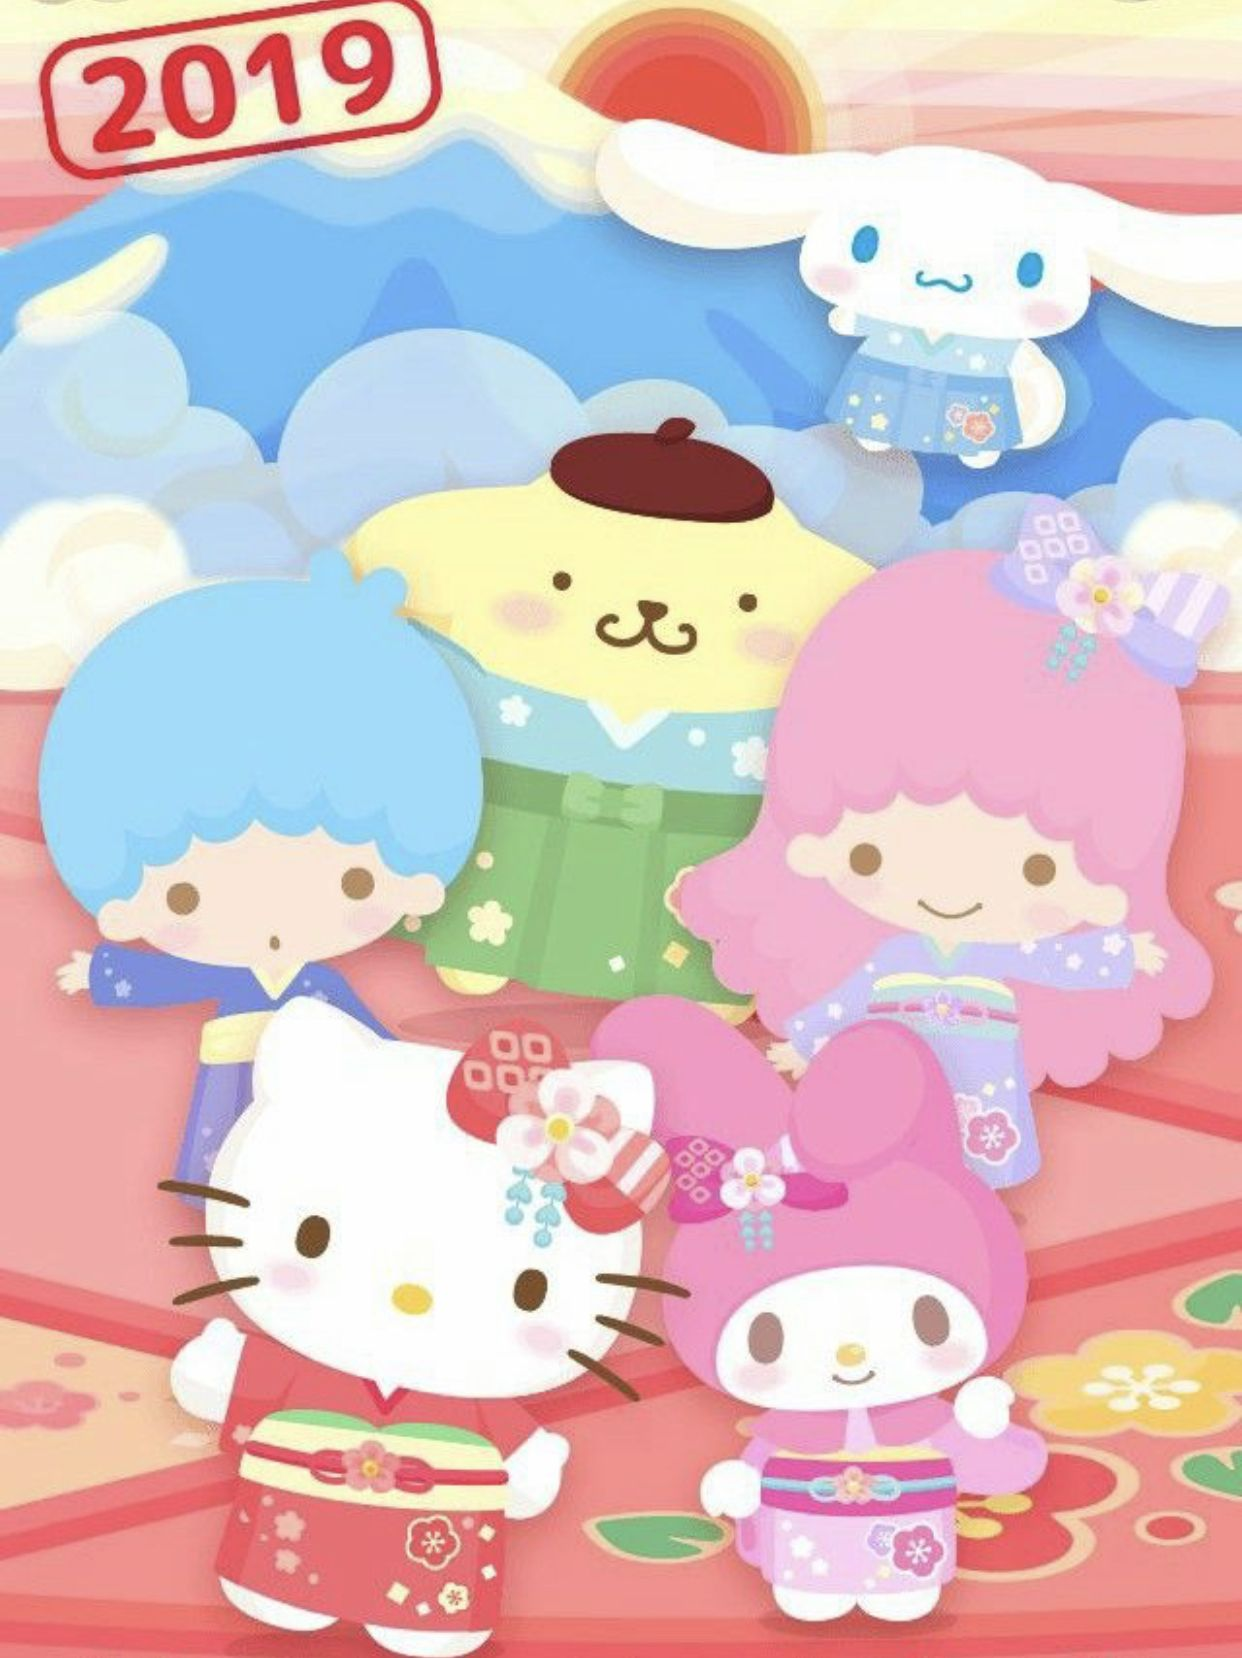 Sanrio 2019 Sanrio Characters Hello Kitty Images Hello